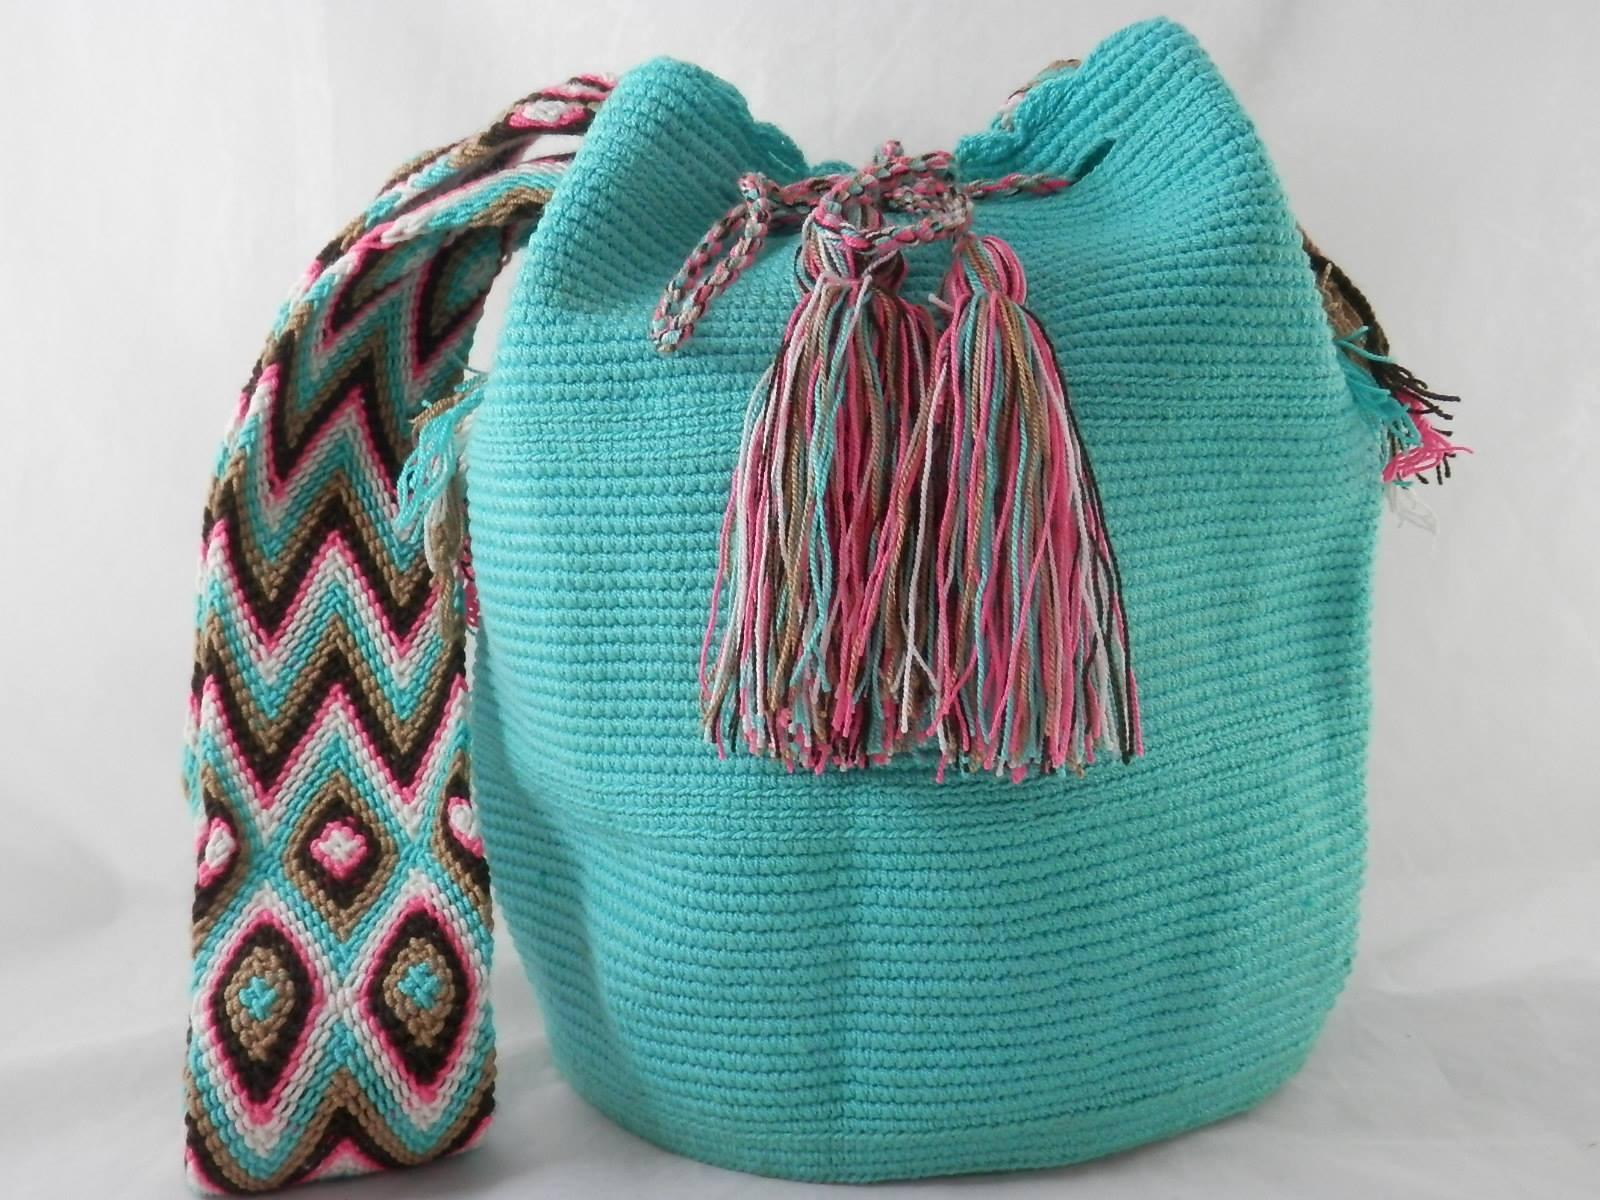 Wayuu Bag by PPS-GA 358